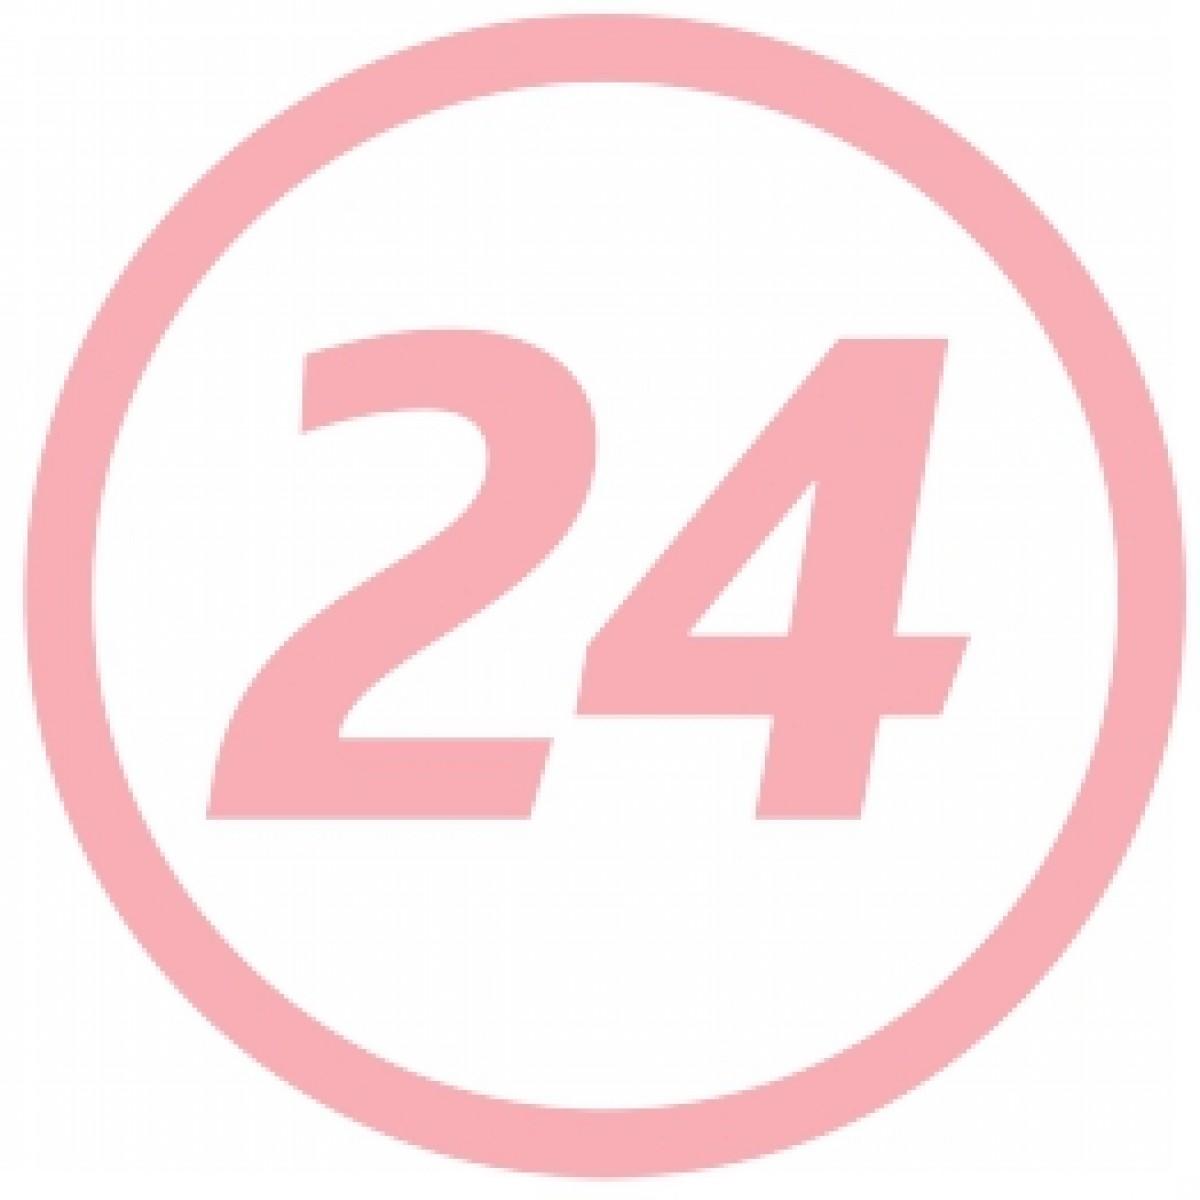 HARTMANN Peha-Crepp Fasa Elastica Pentru Fixare Pansamentelor 10cm x 4m, Fasa, 1buc